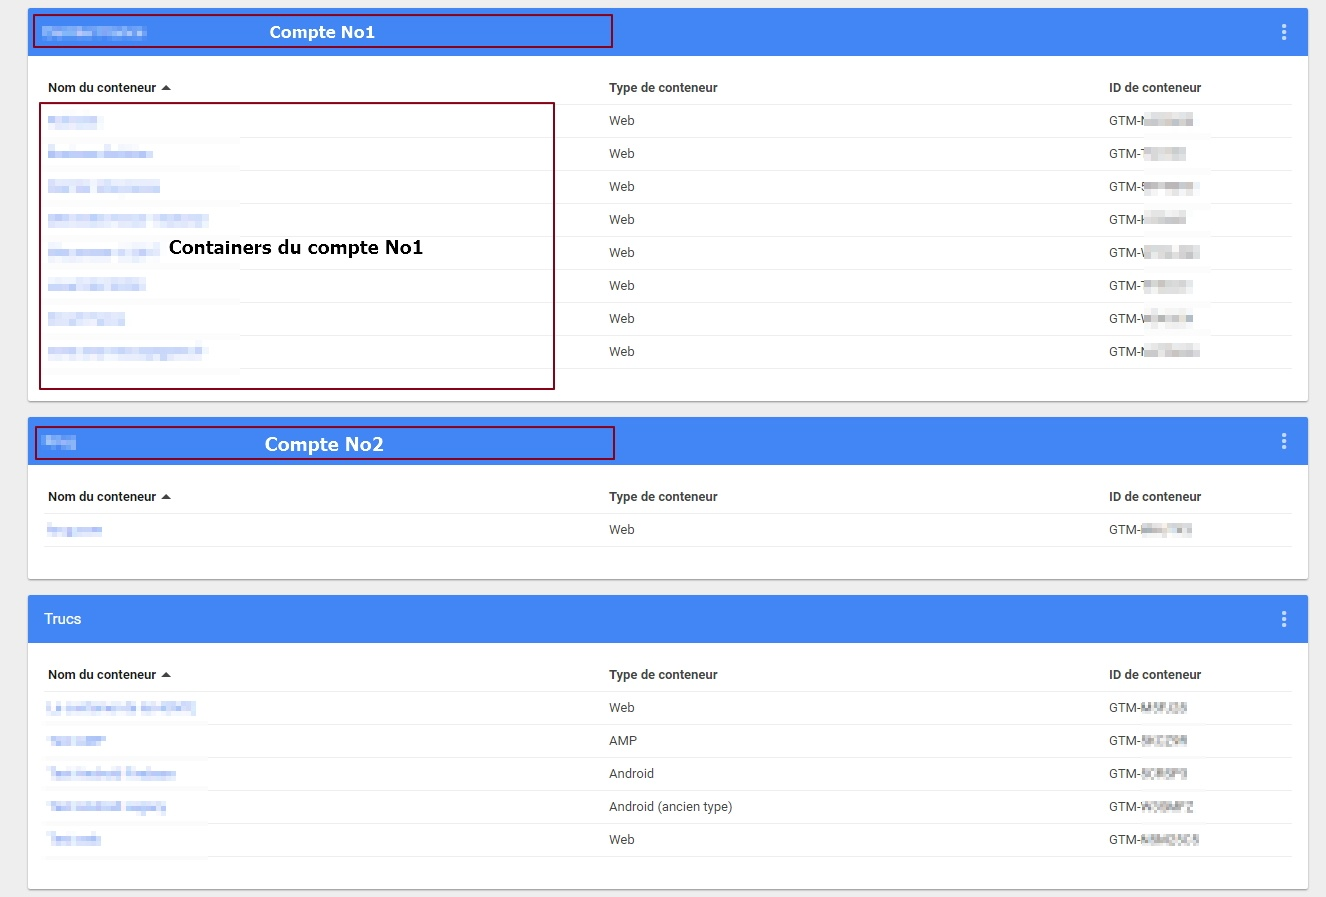 Architecture des comptes et containers Google Tag Manager